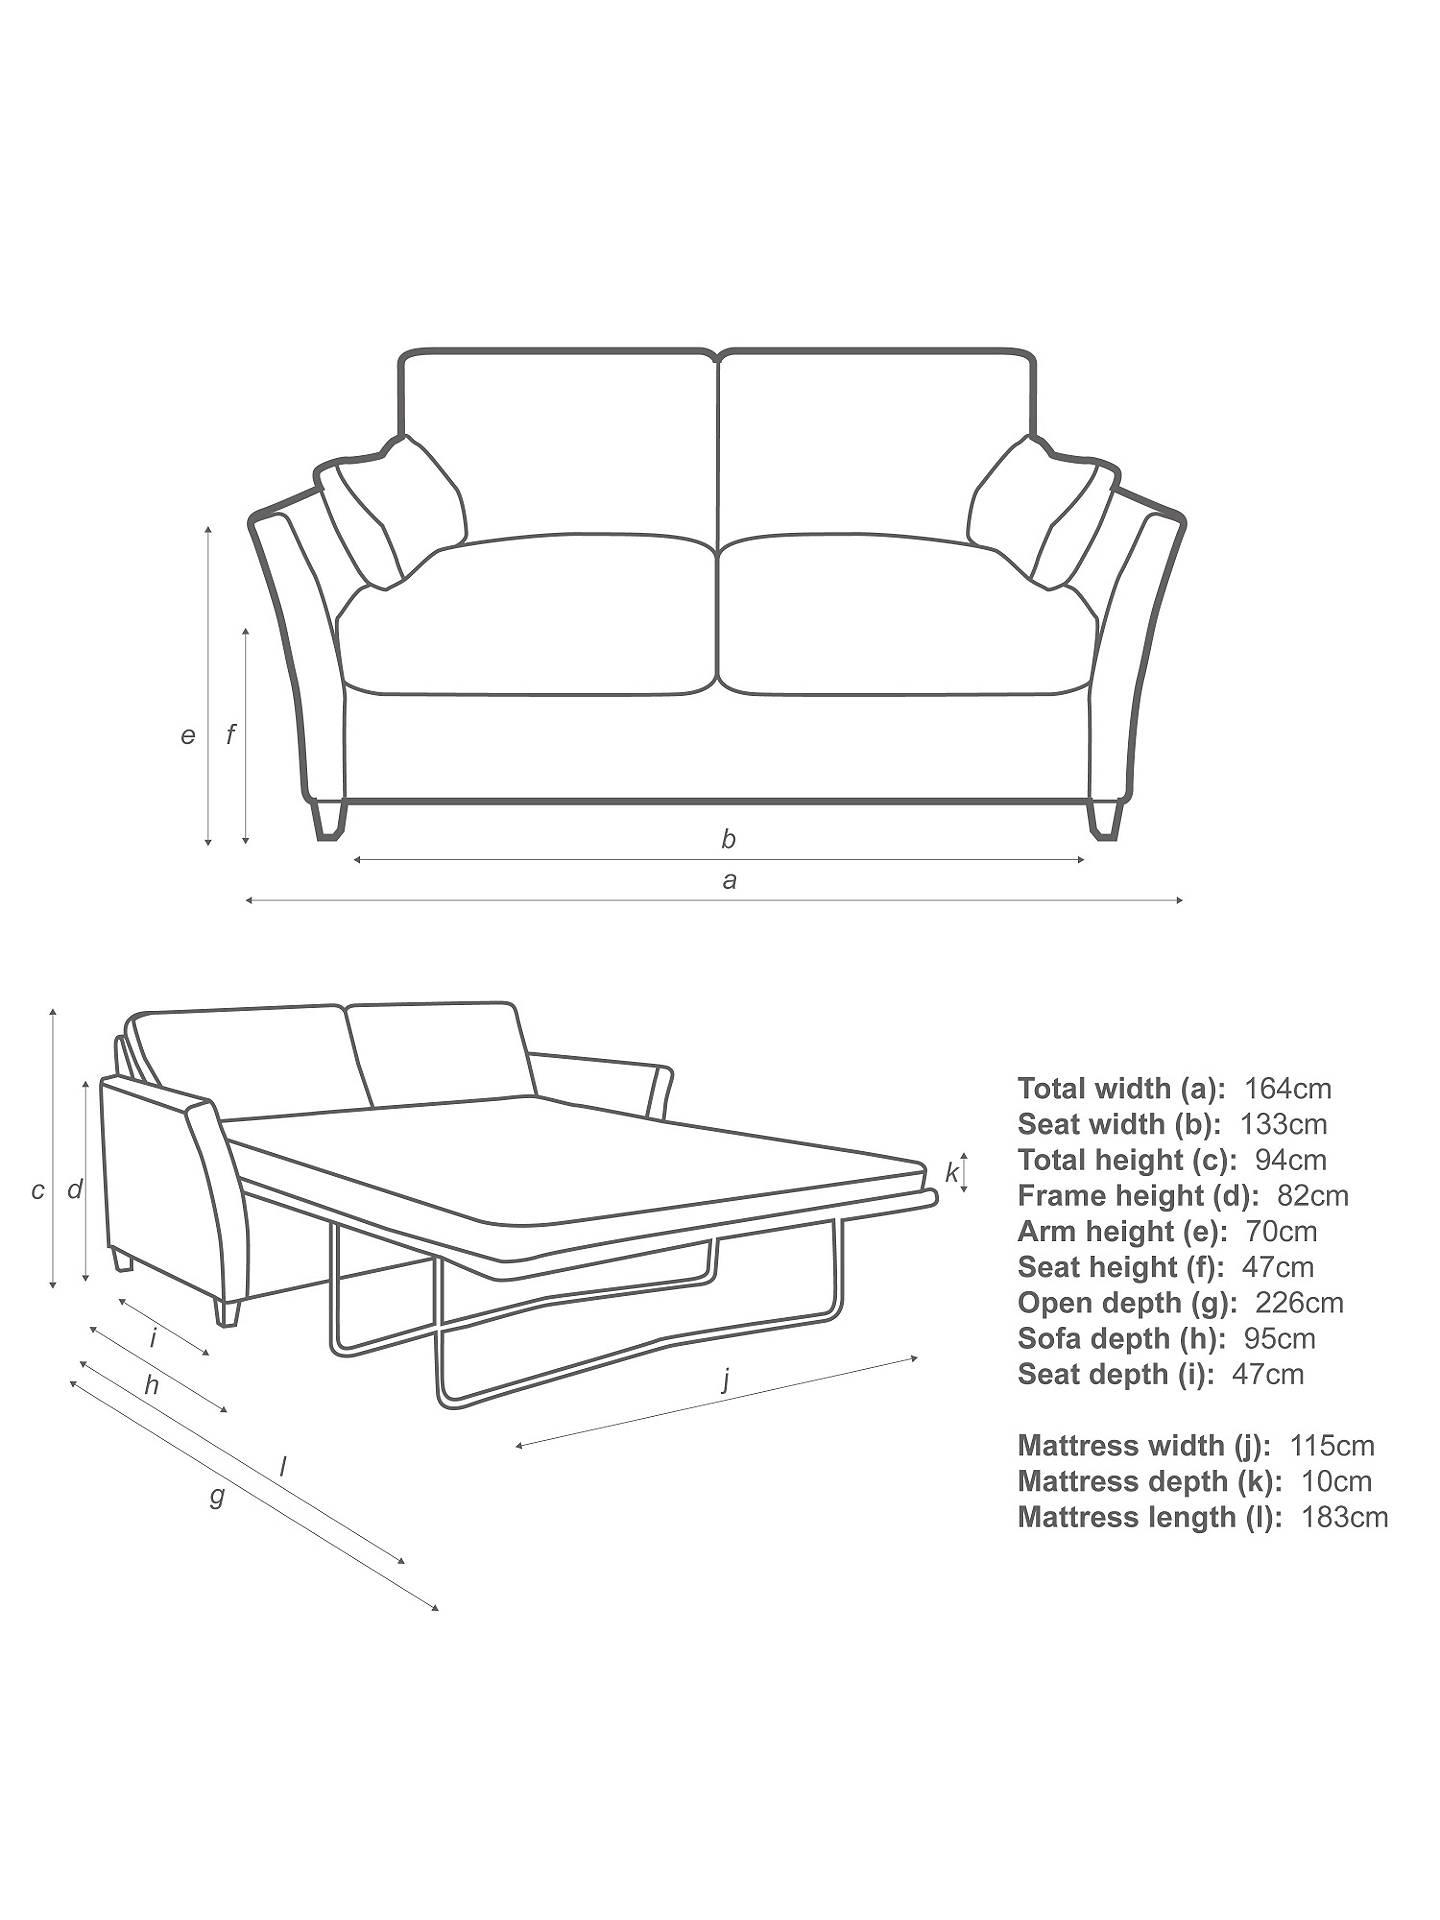 John Lewis Partners Chopin Small Pocket Sprung Sofa Bed Online At Johnlewis